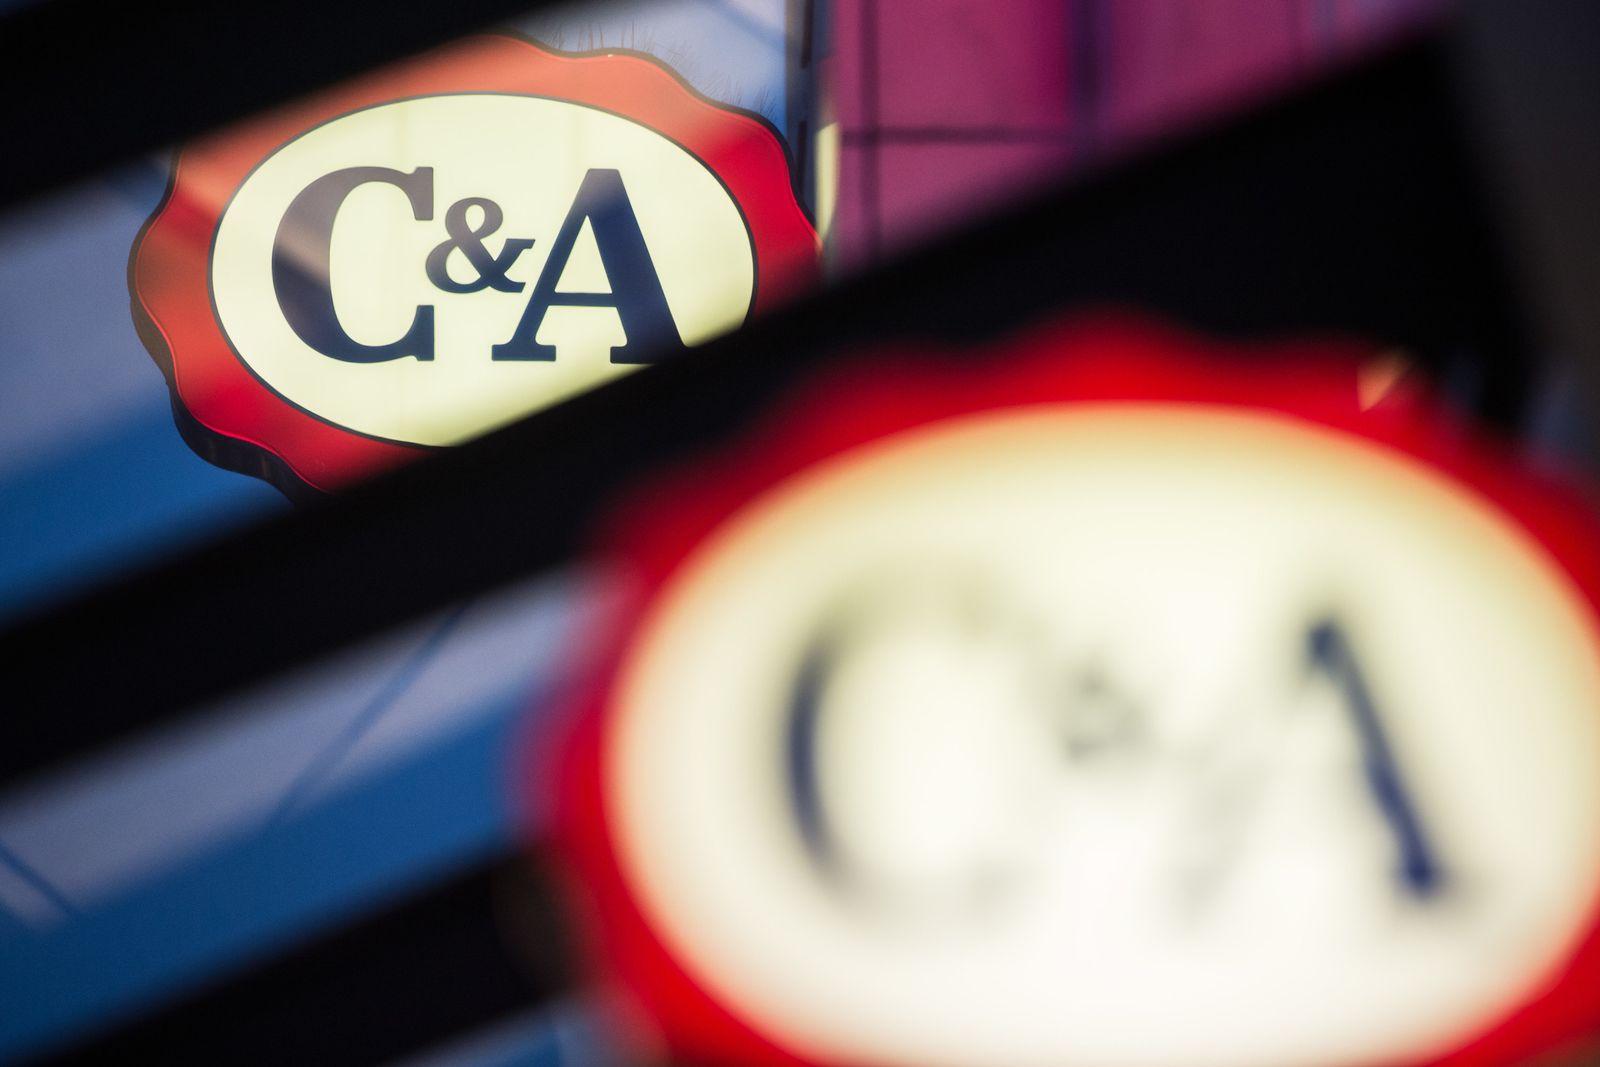 C&A - Filiale in Düsseldorf